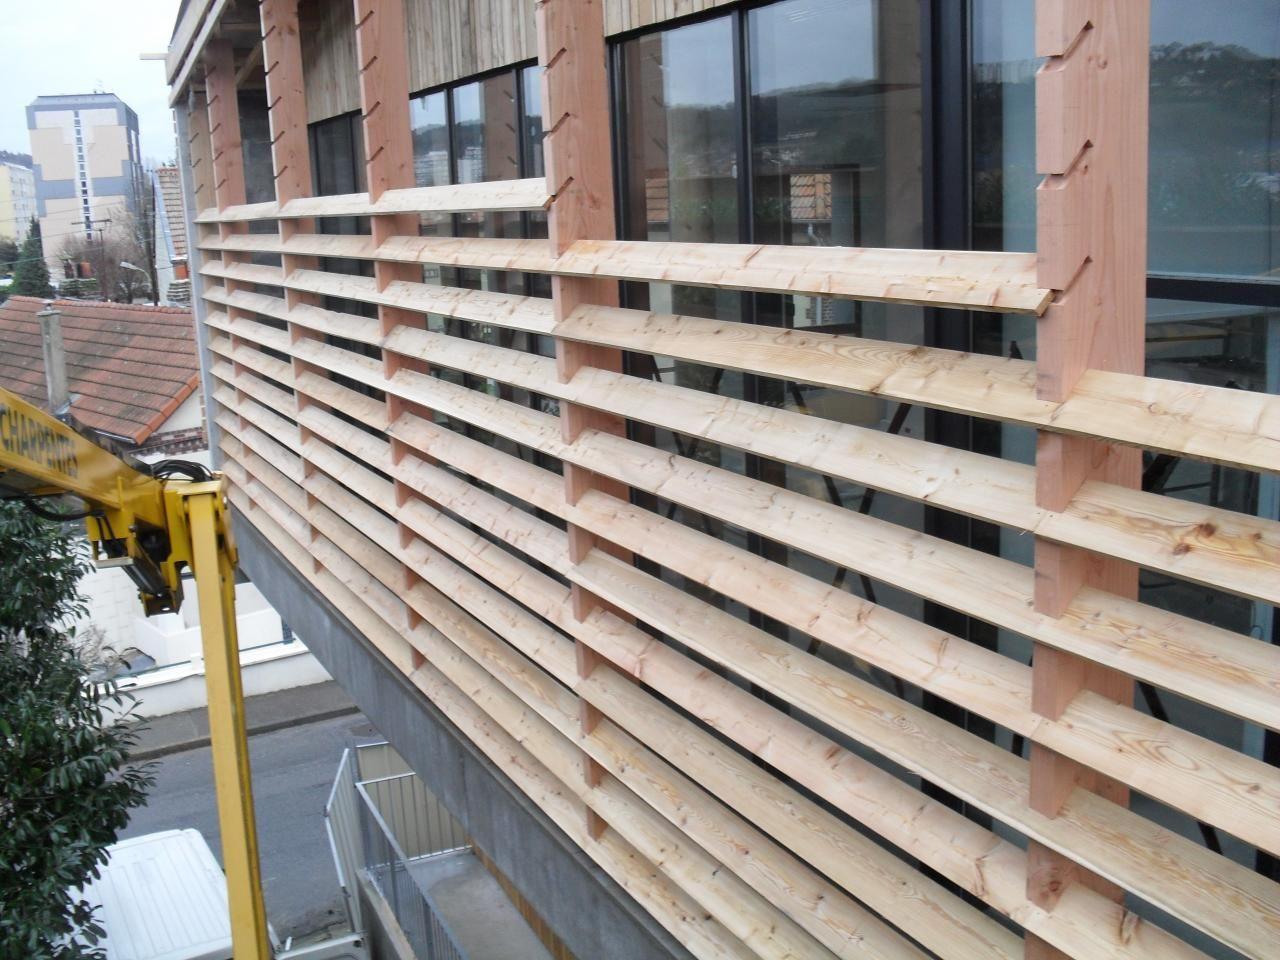 Sdc15778 Jpg 1280 960 Rooftop Terrace Design Terrace Design